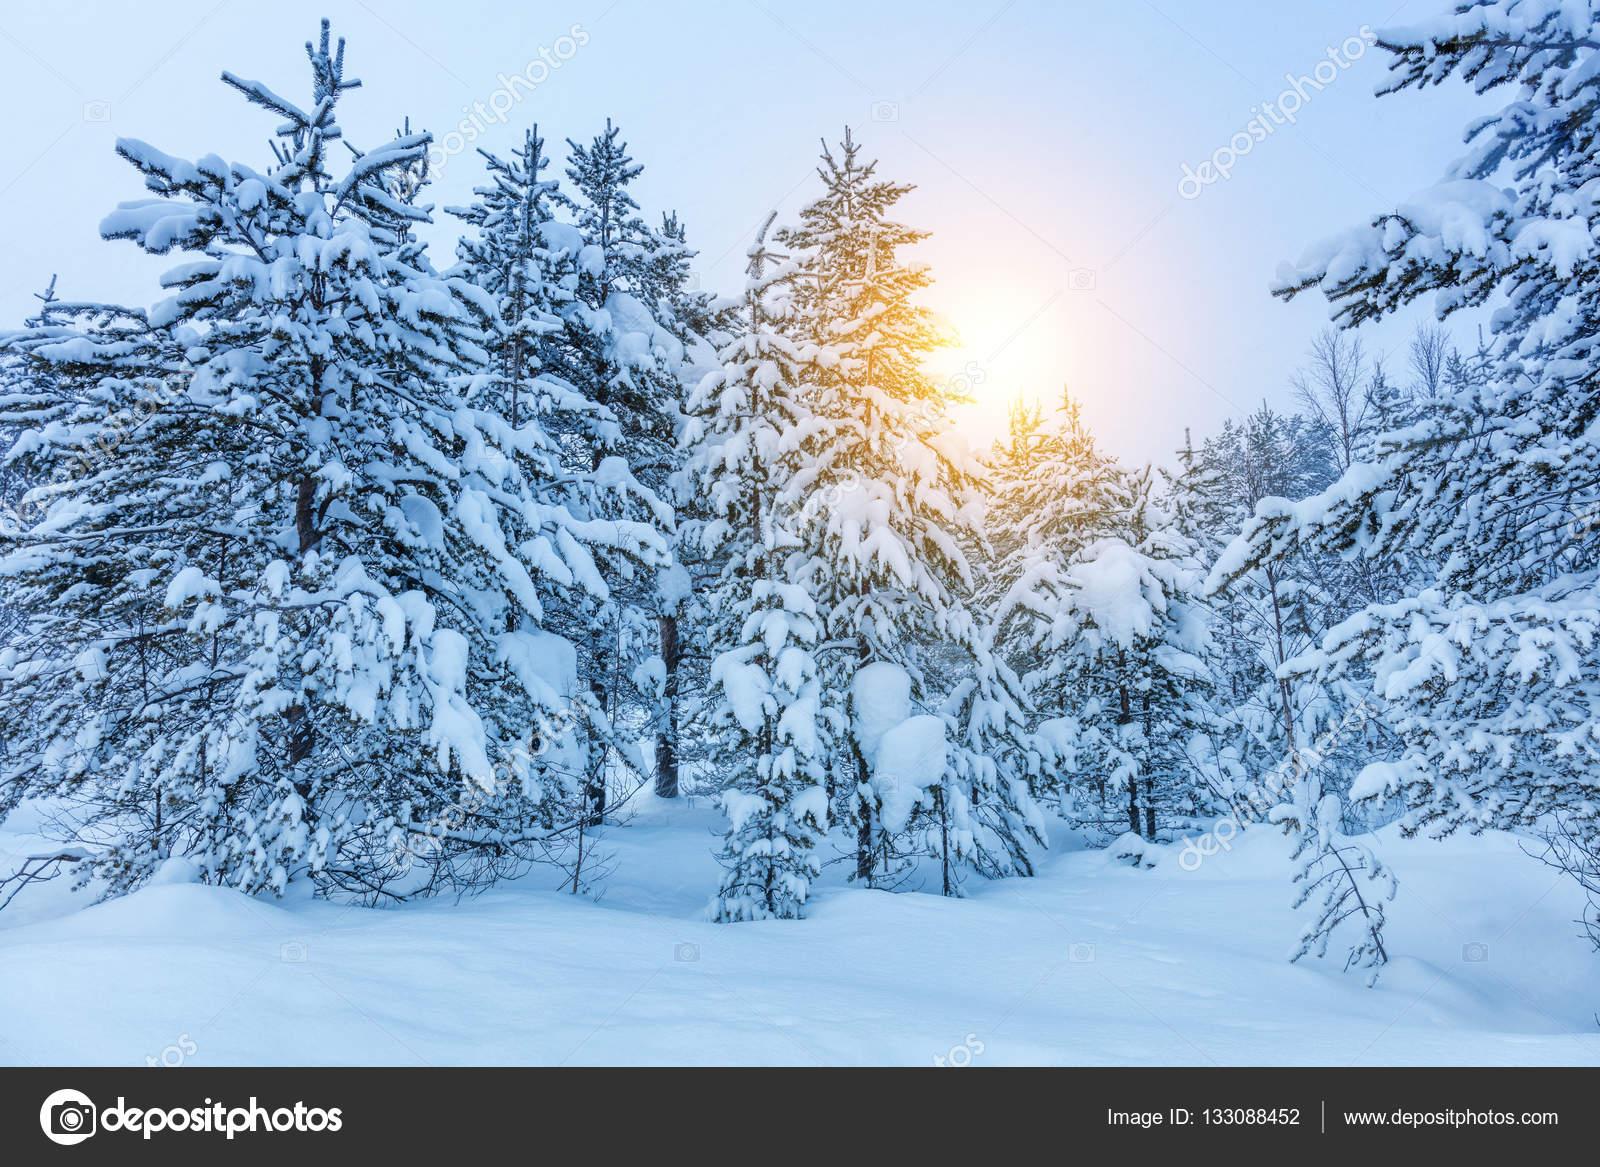 Imágenes: Paisajes Invierno Fondos